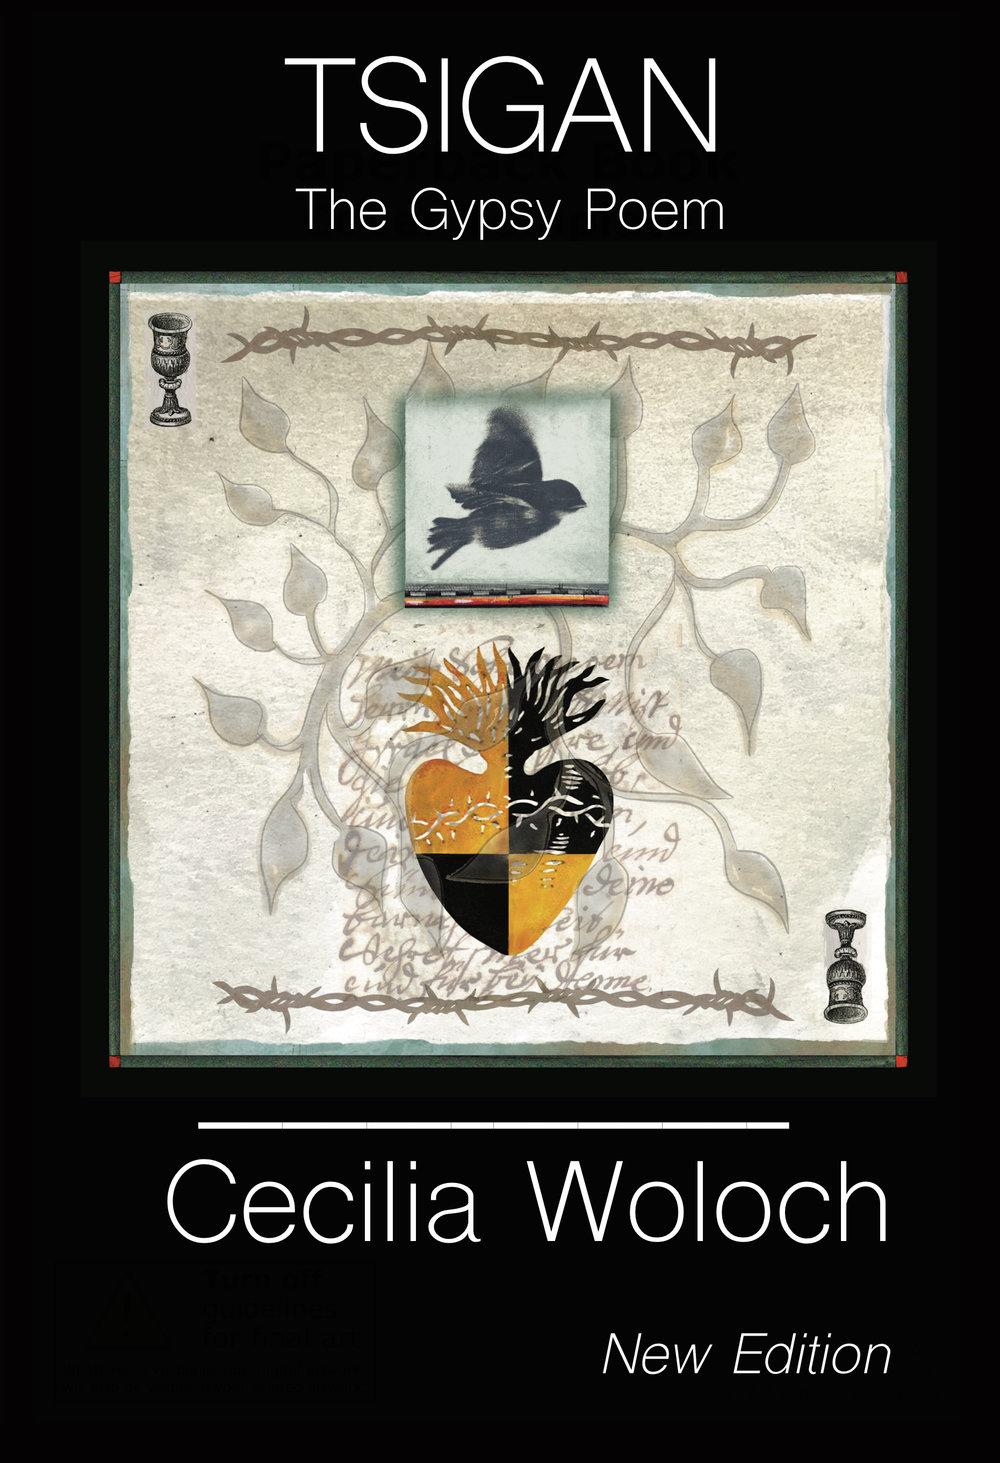 Tsigan Cover Image Cecilia Woloch.jpg